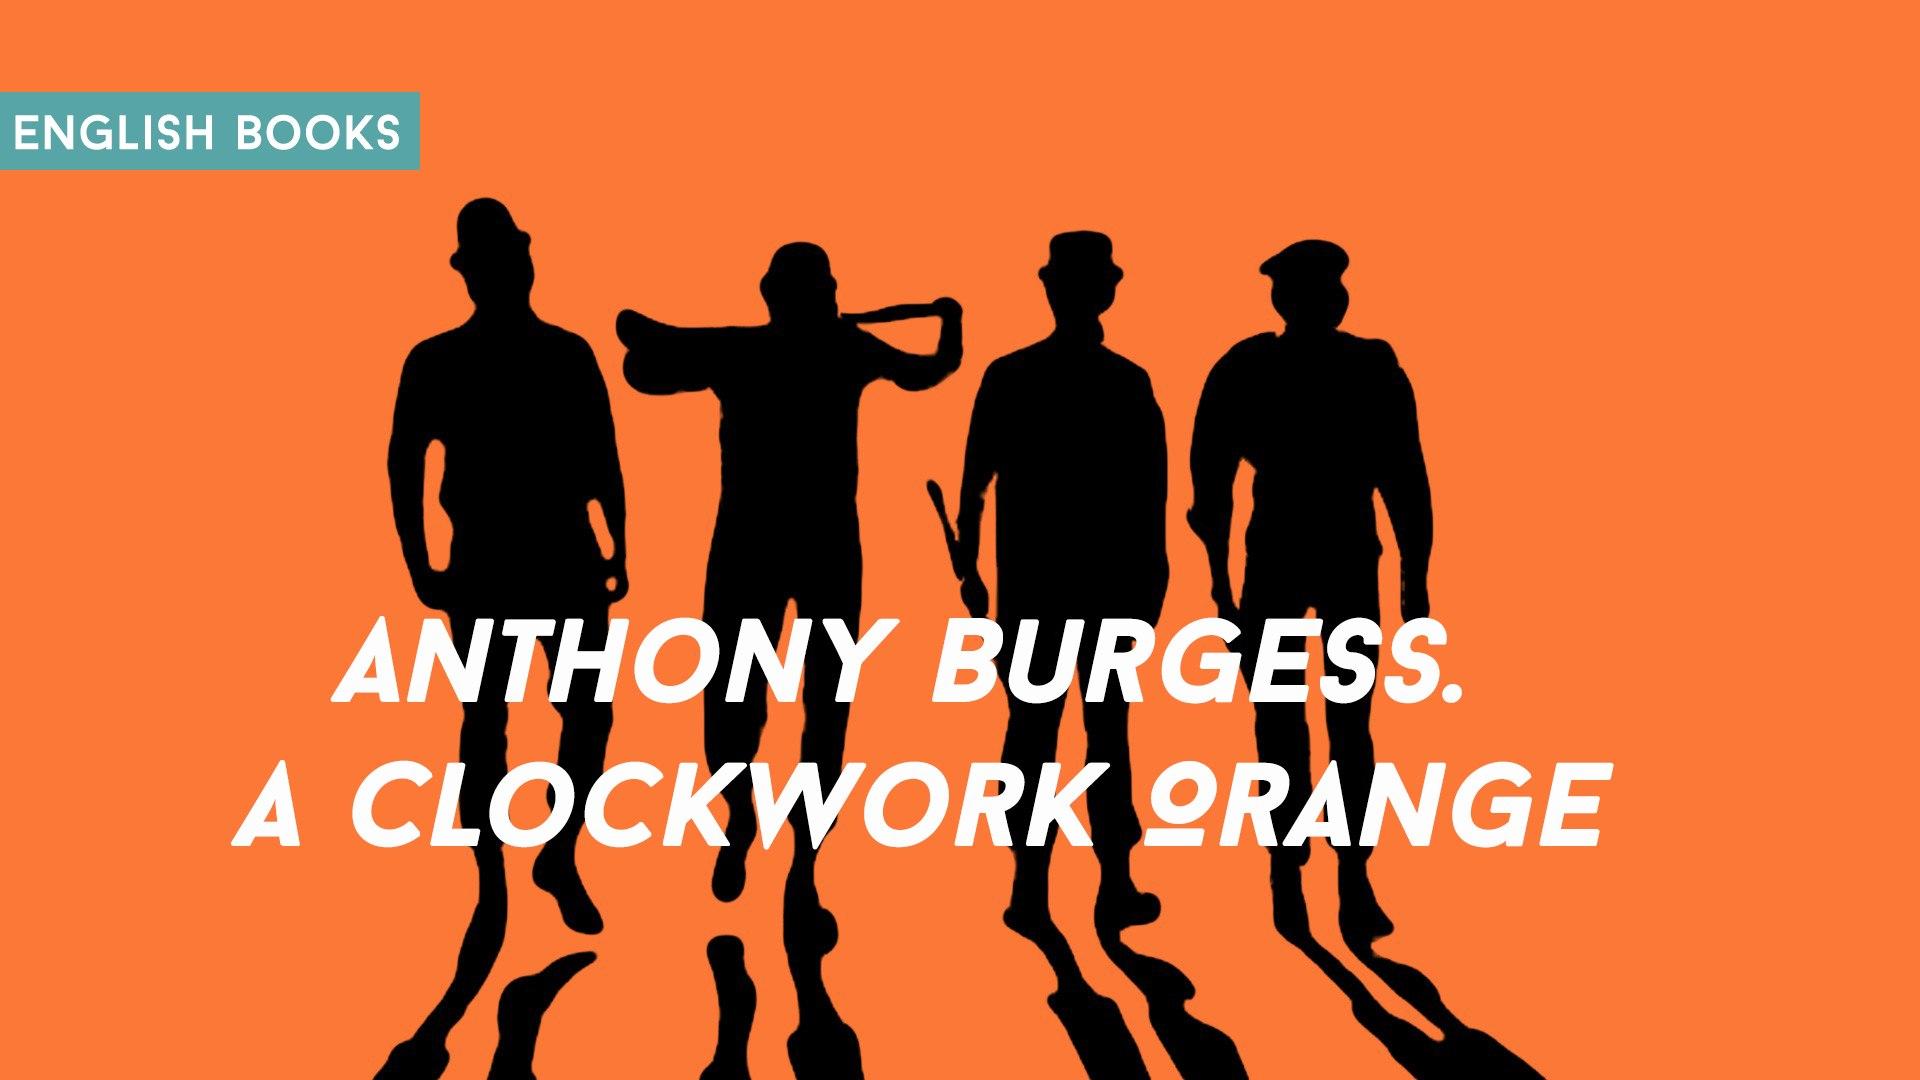 Anthony Burgess — A Clockwork Orange